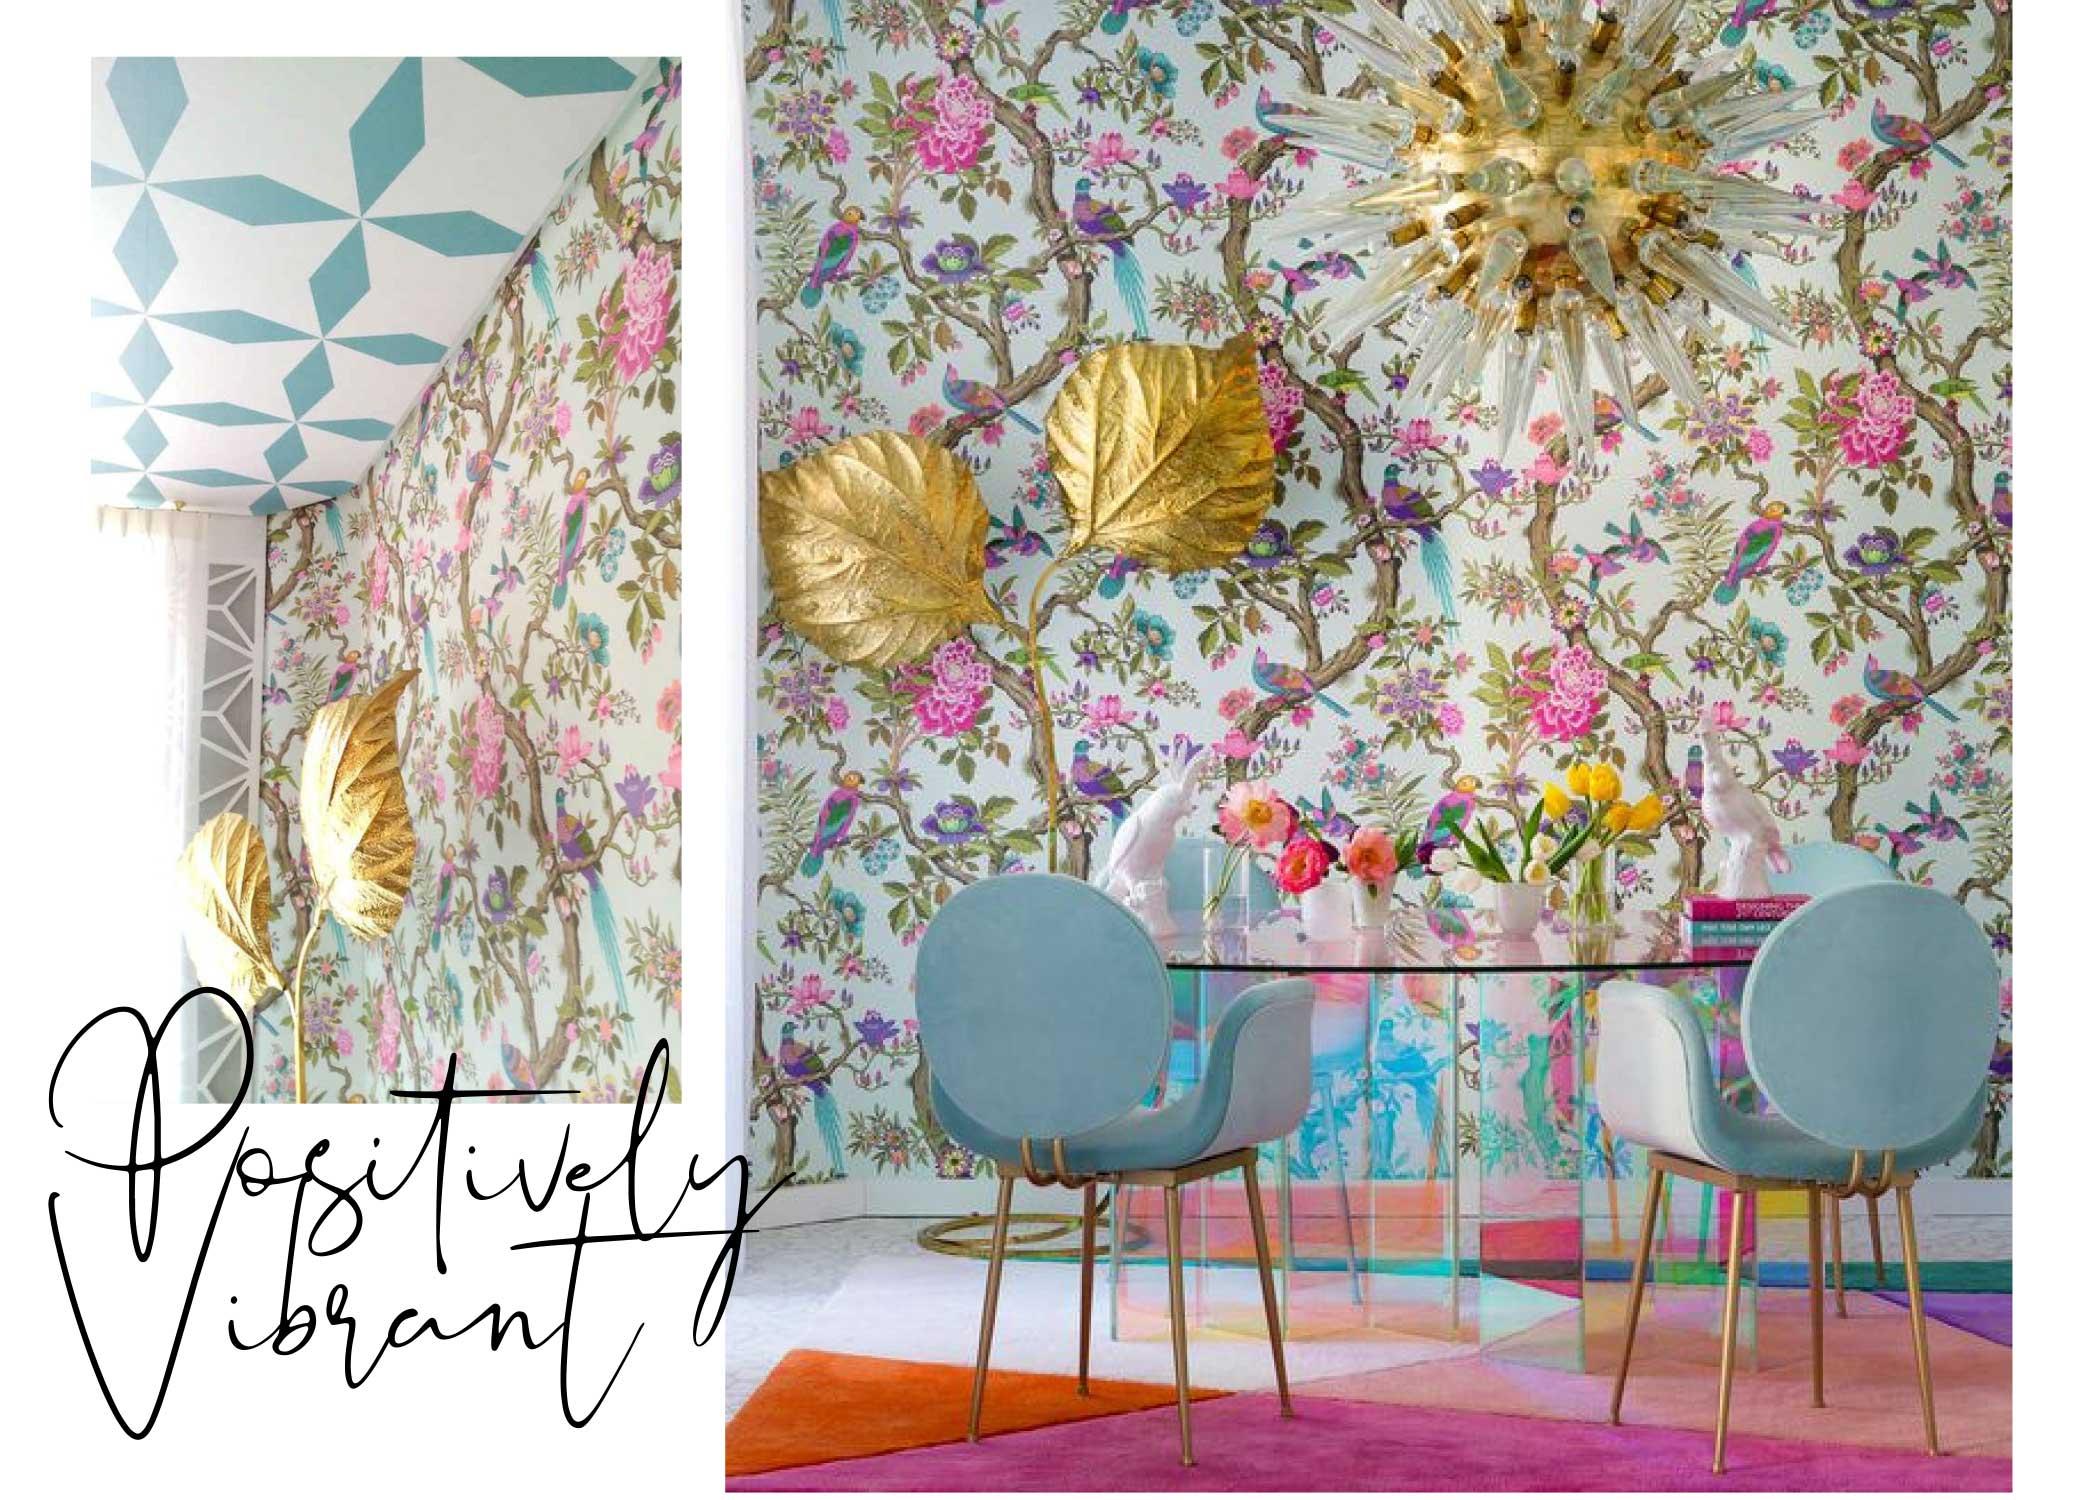 positively vibrant design inspiration